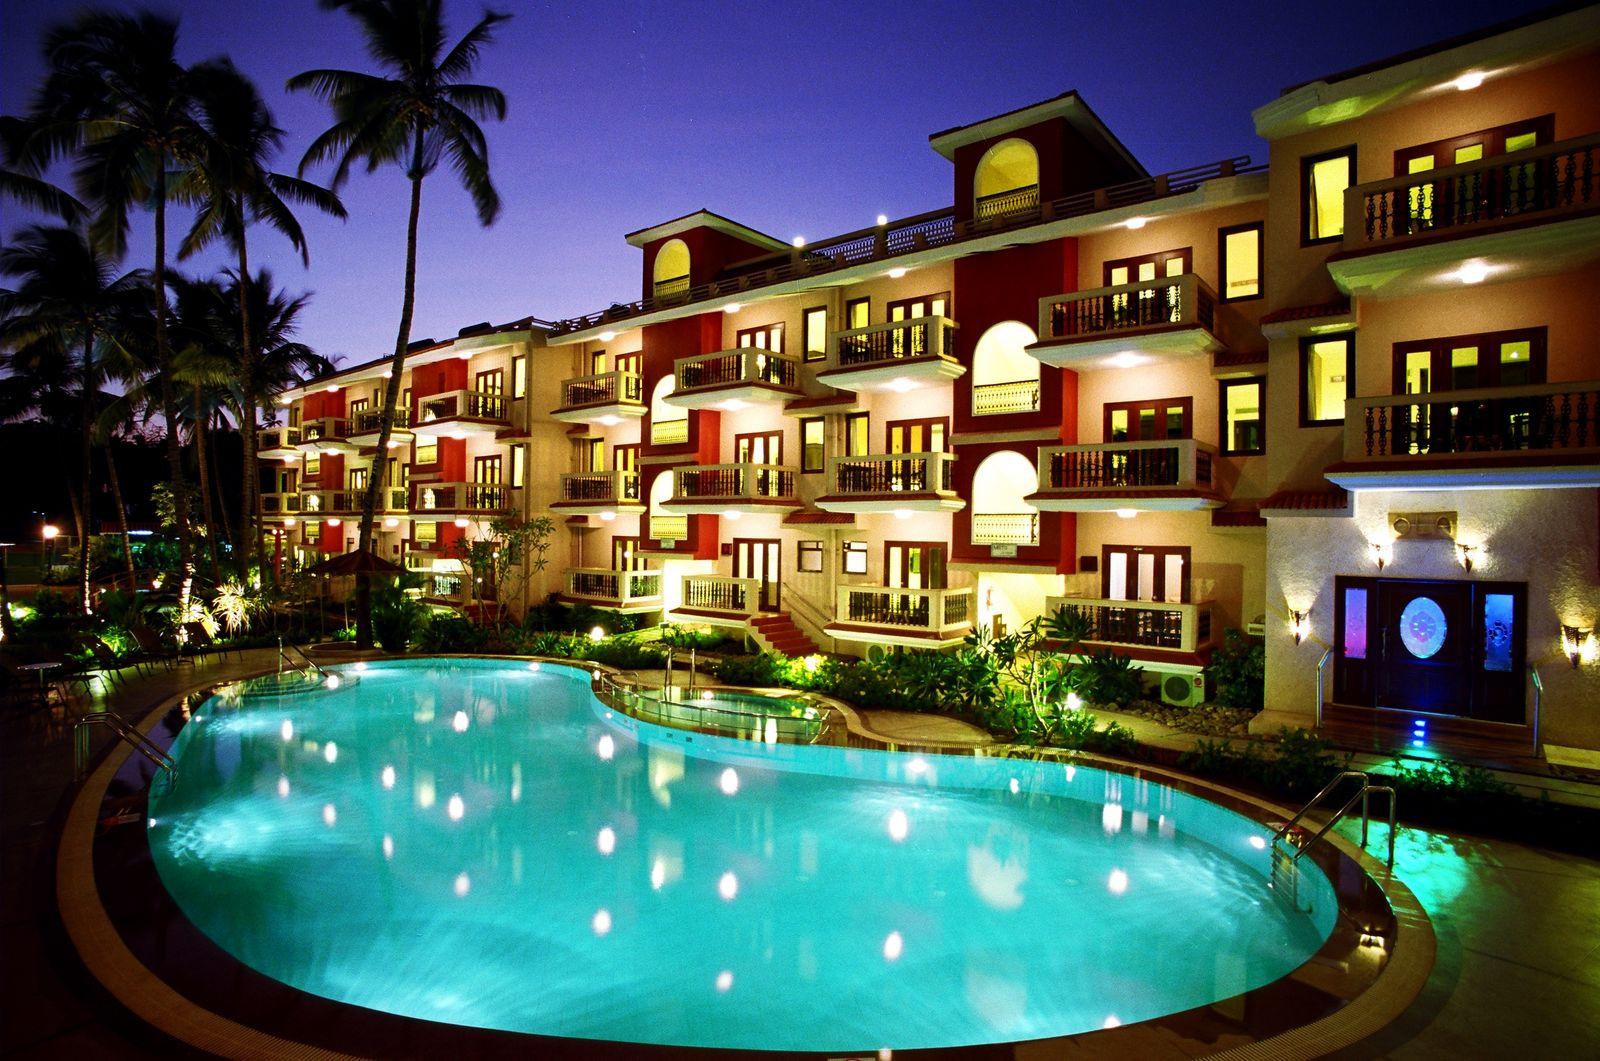 ECHG Asian Hotel